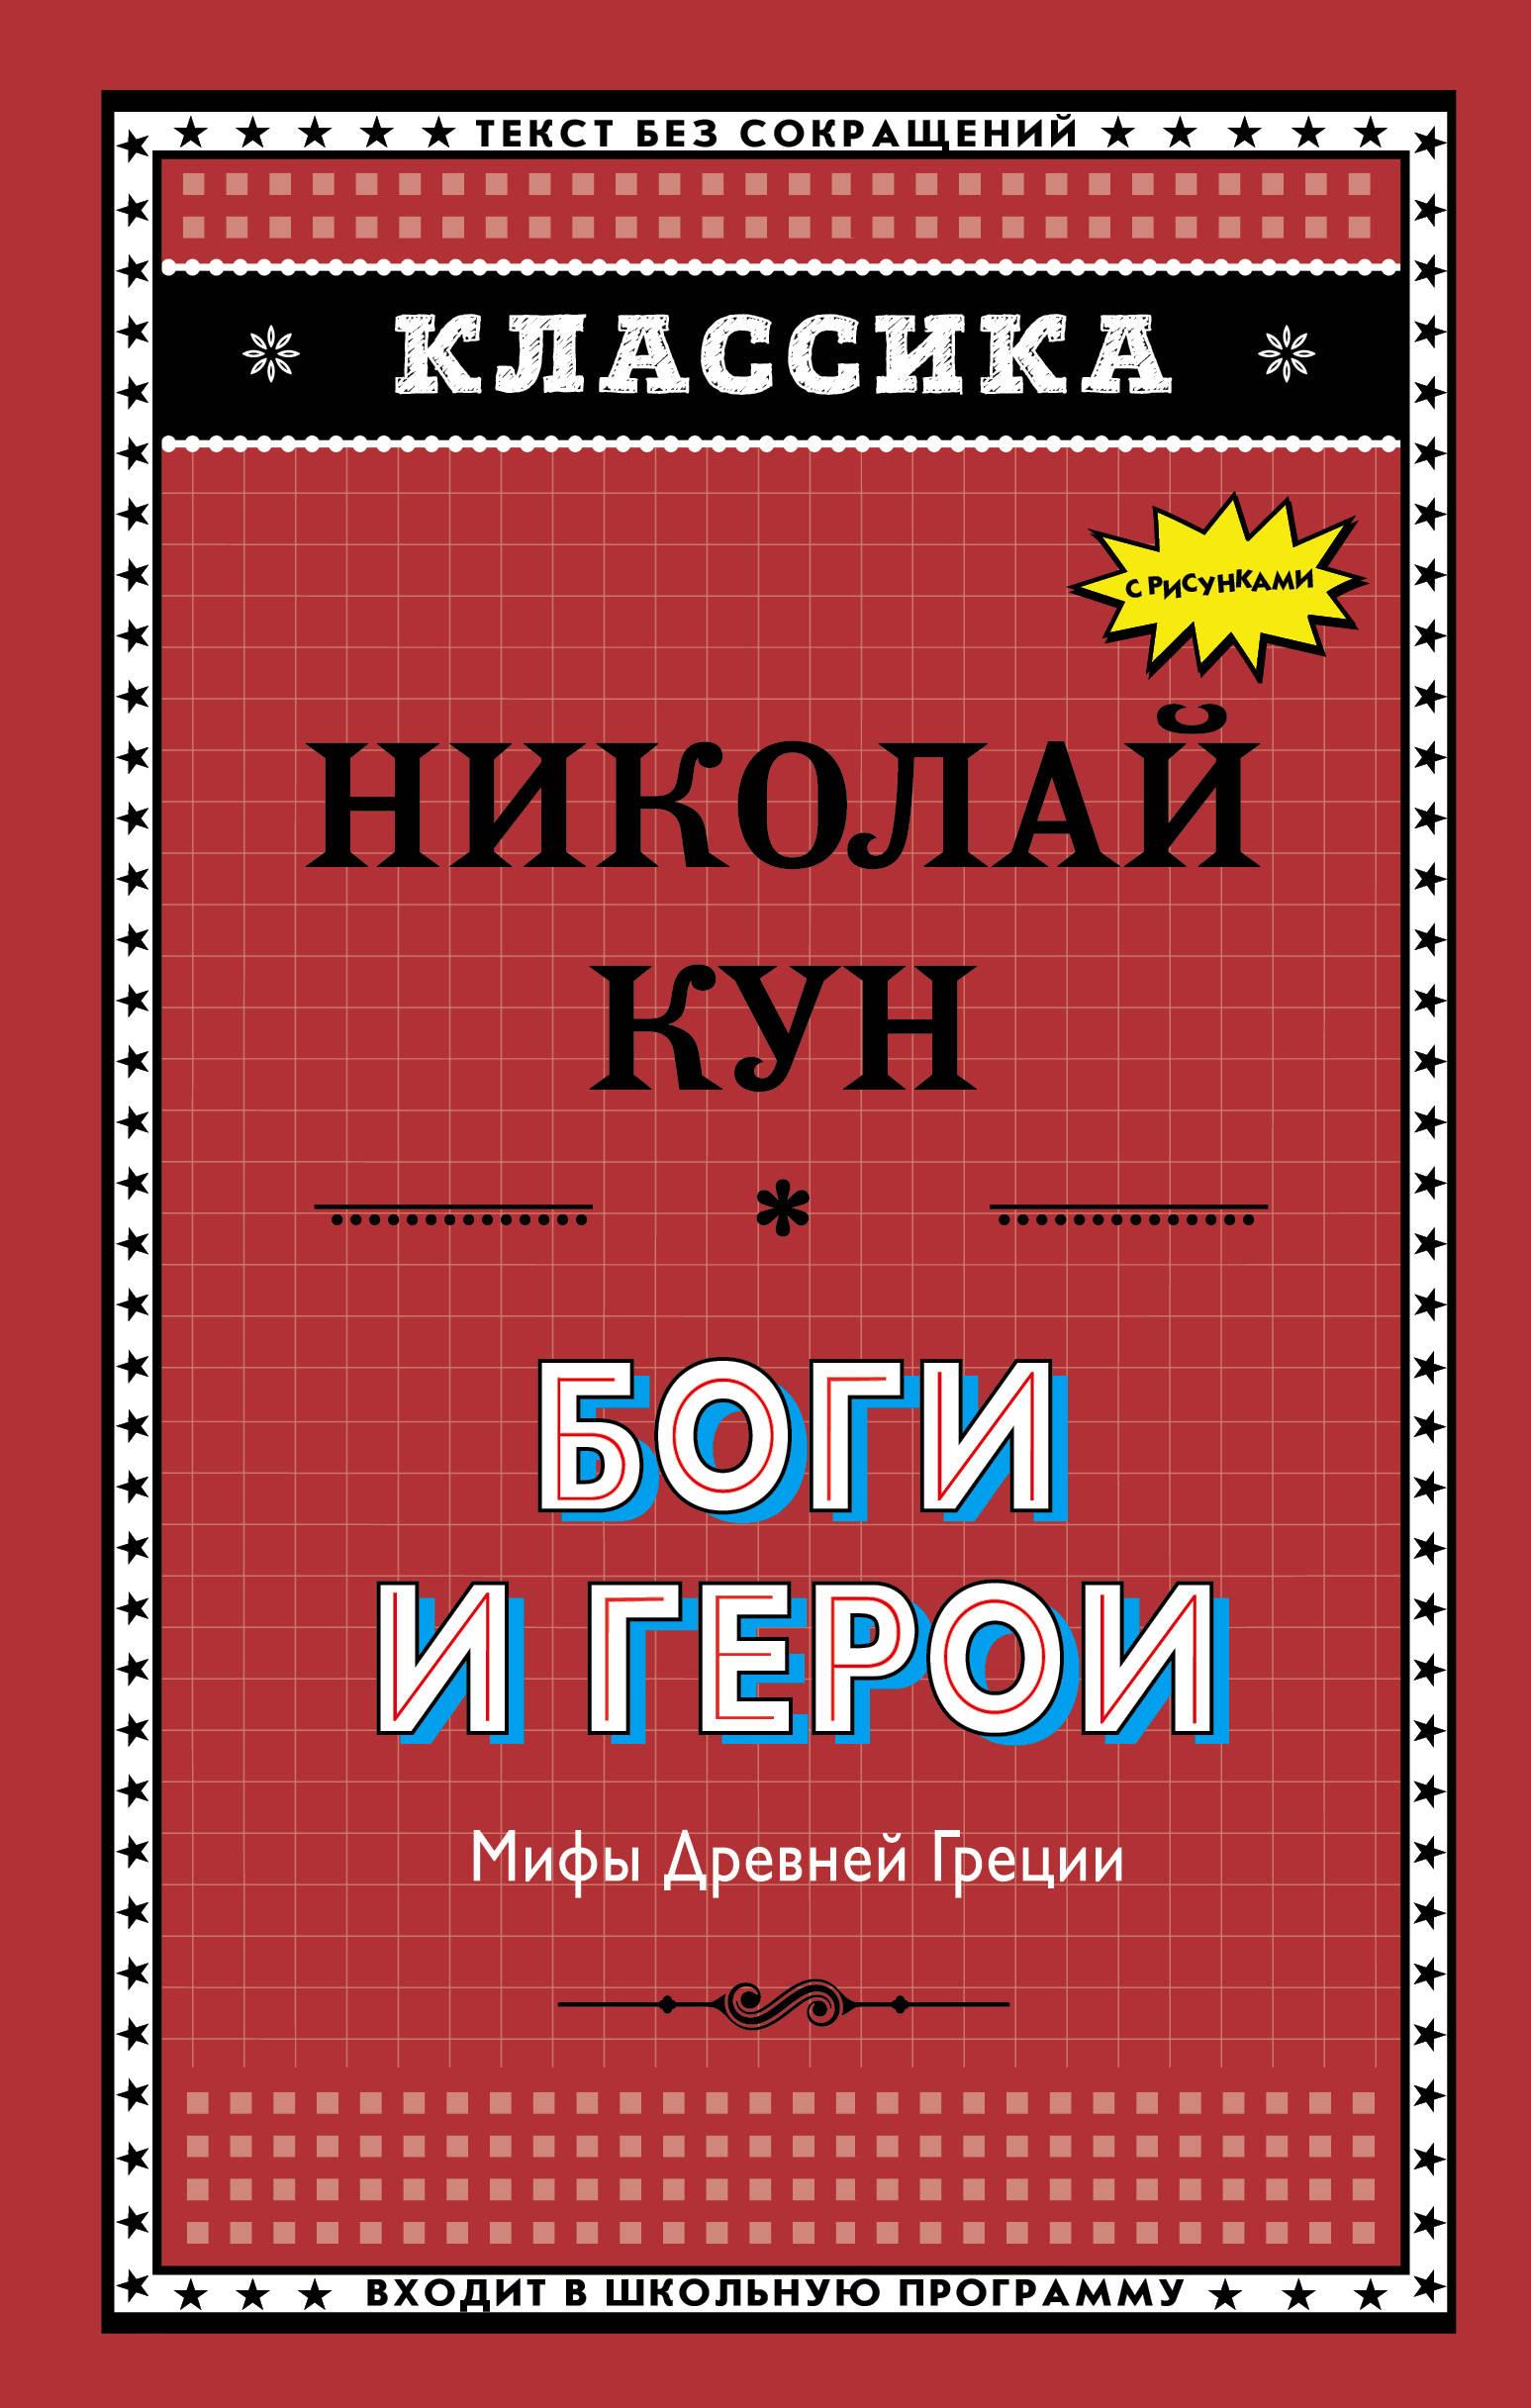 Николай Кун. Боги и герои. Мифы Древней Греции